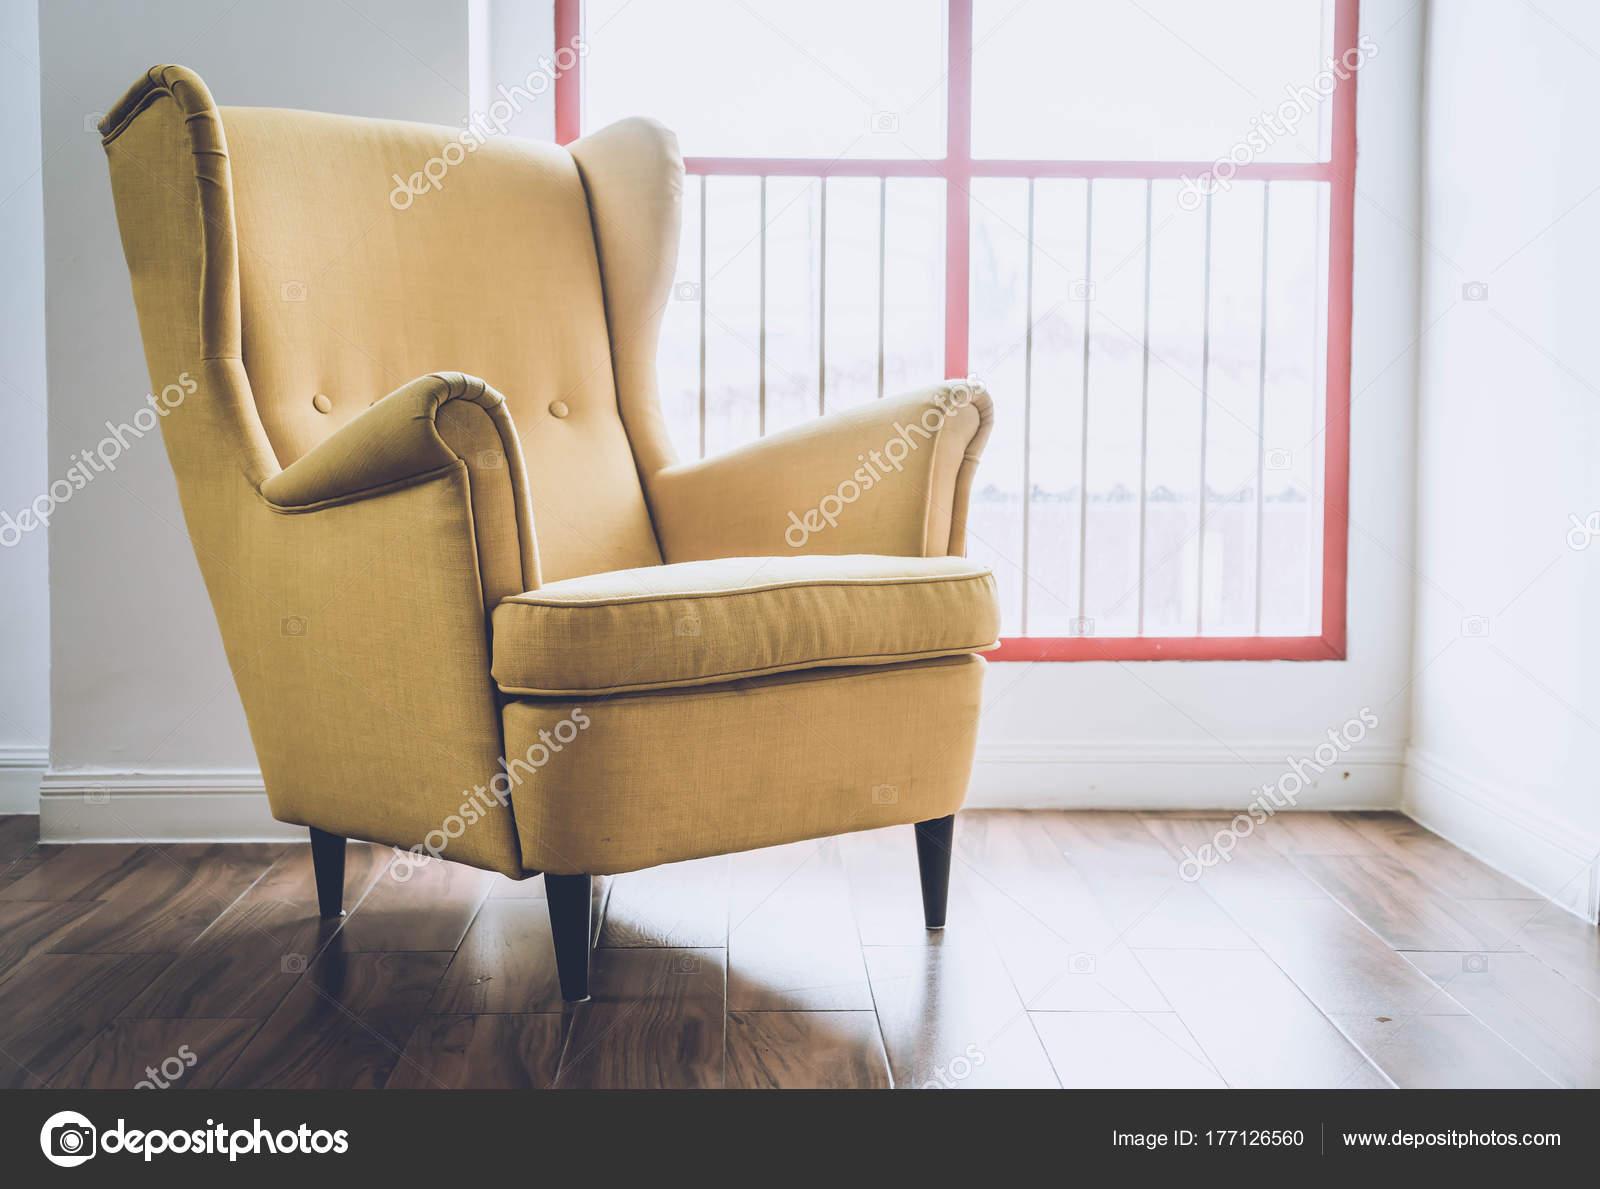 Oude fauteuil decoratie in huis u2014 stockfoto © topntp #177126560